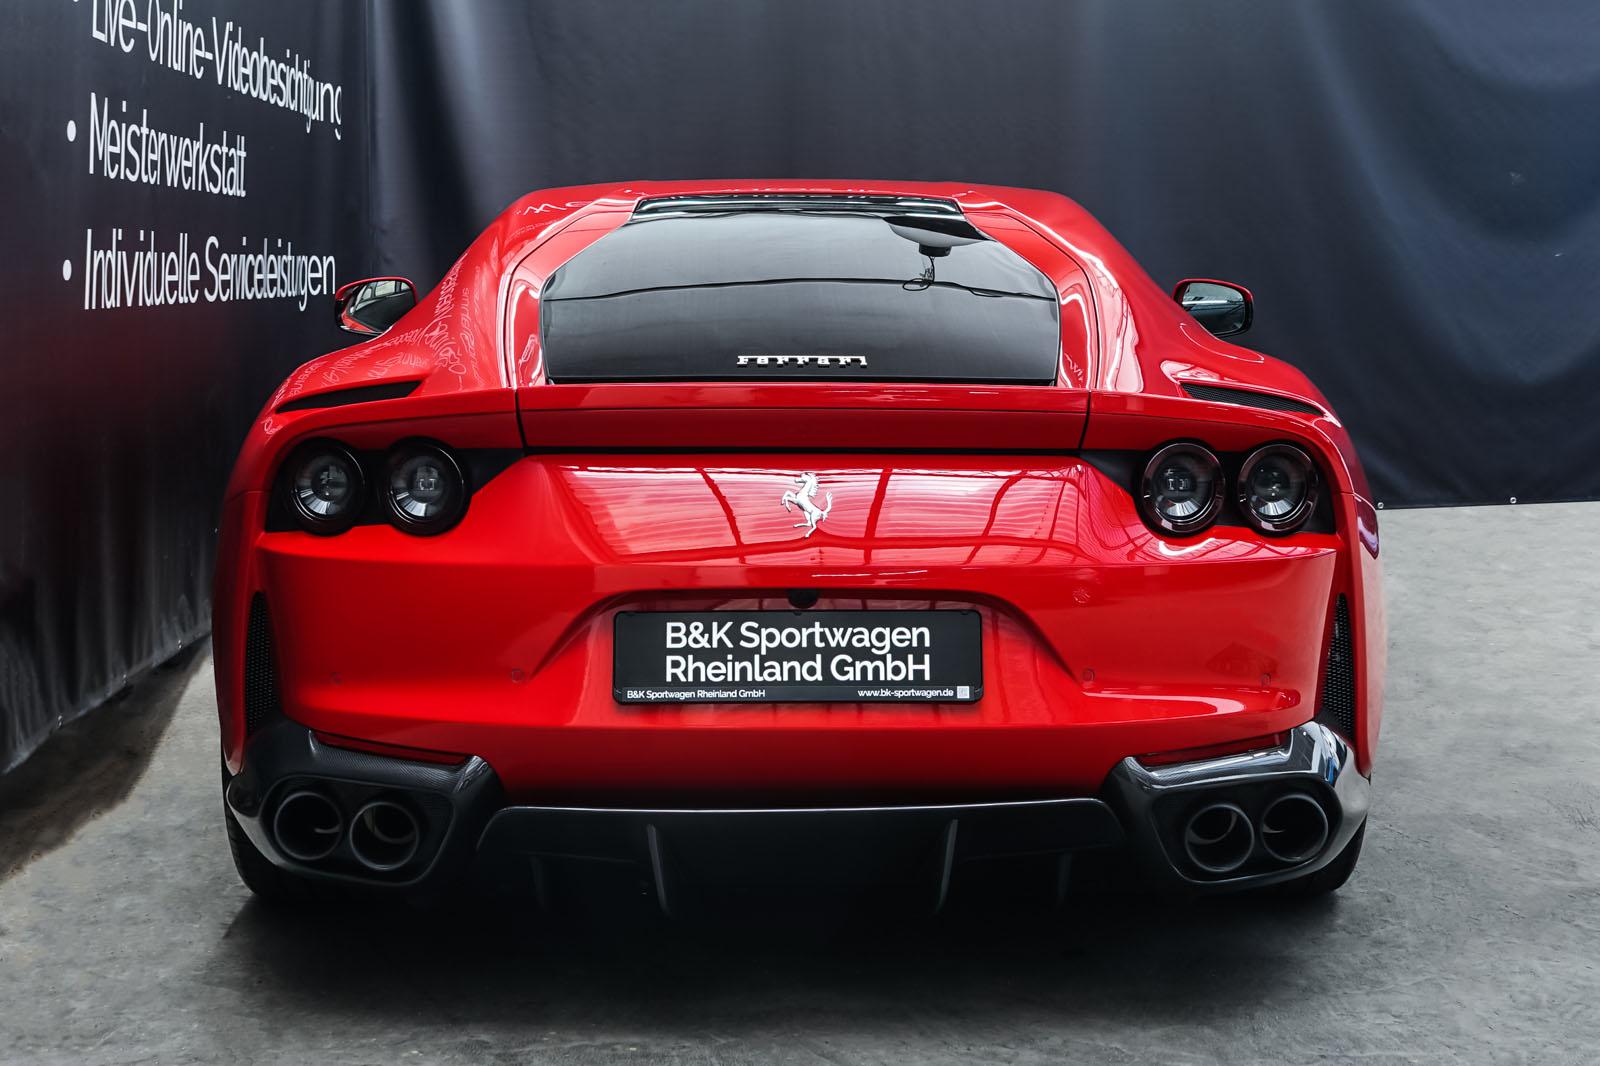 Ferrari_812_Superfast_Rot_Schwarz_FER-9922_14_w